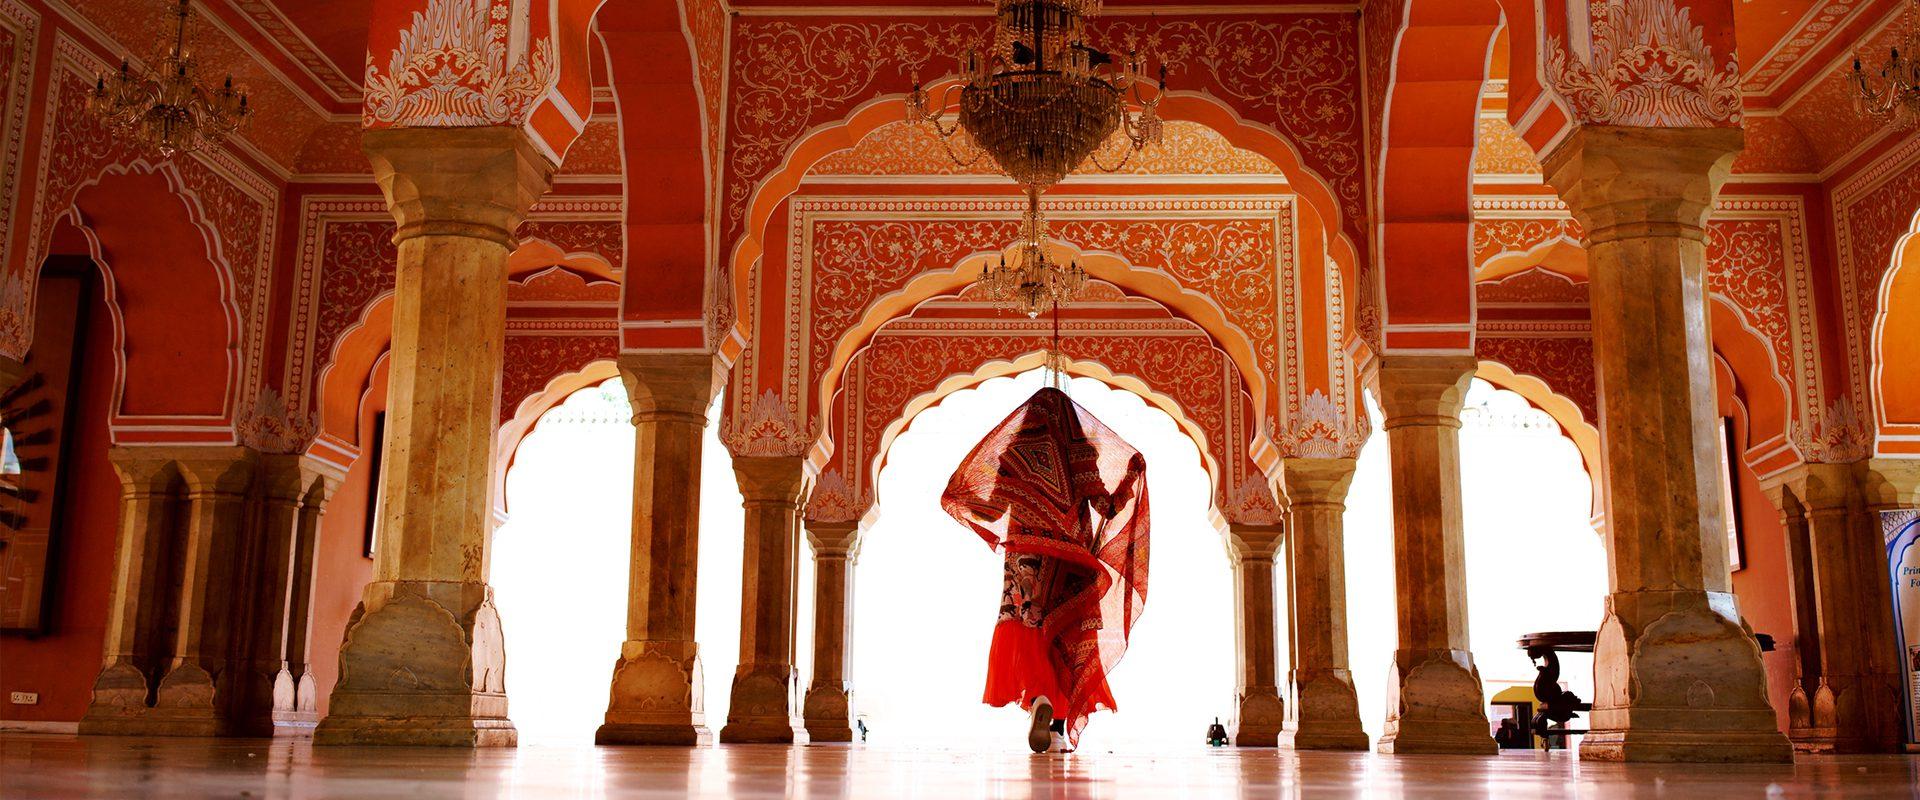 Indian Palace, Jaipur